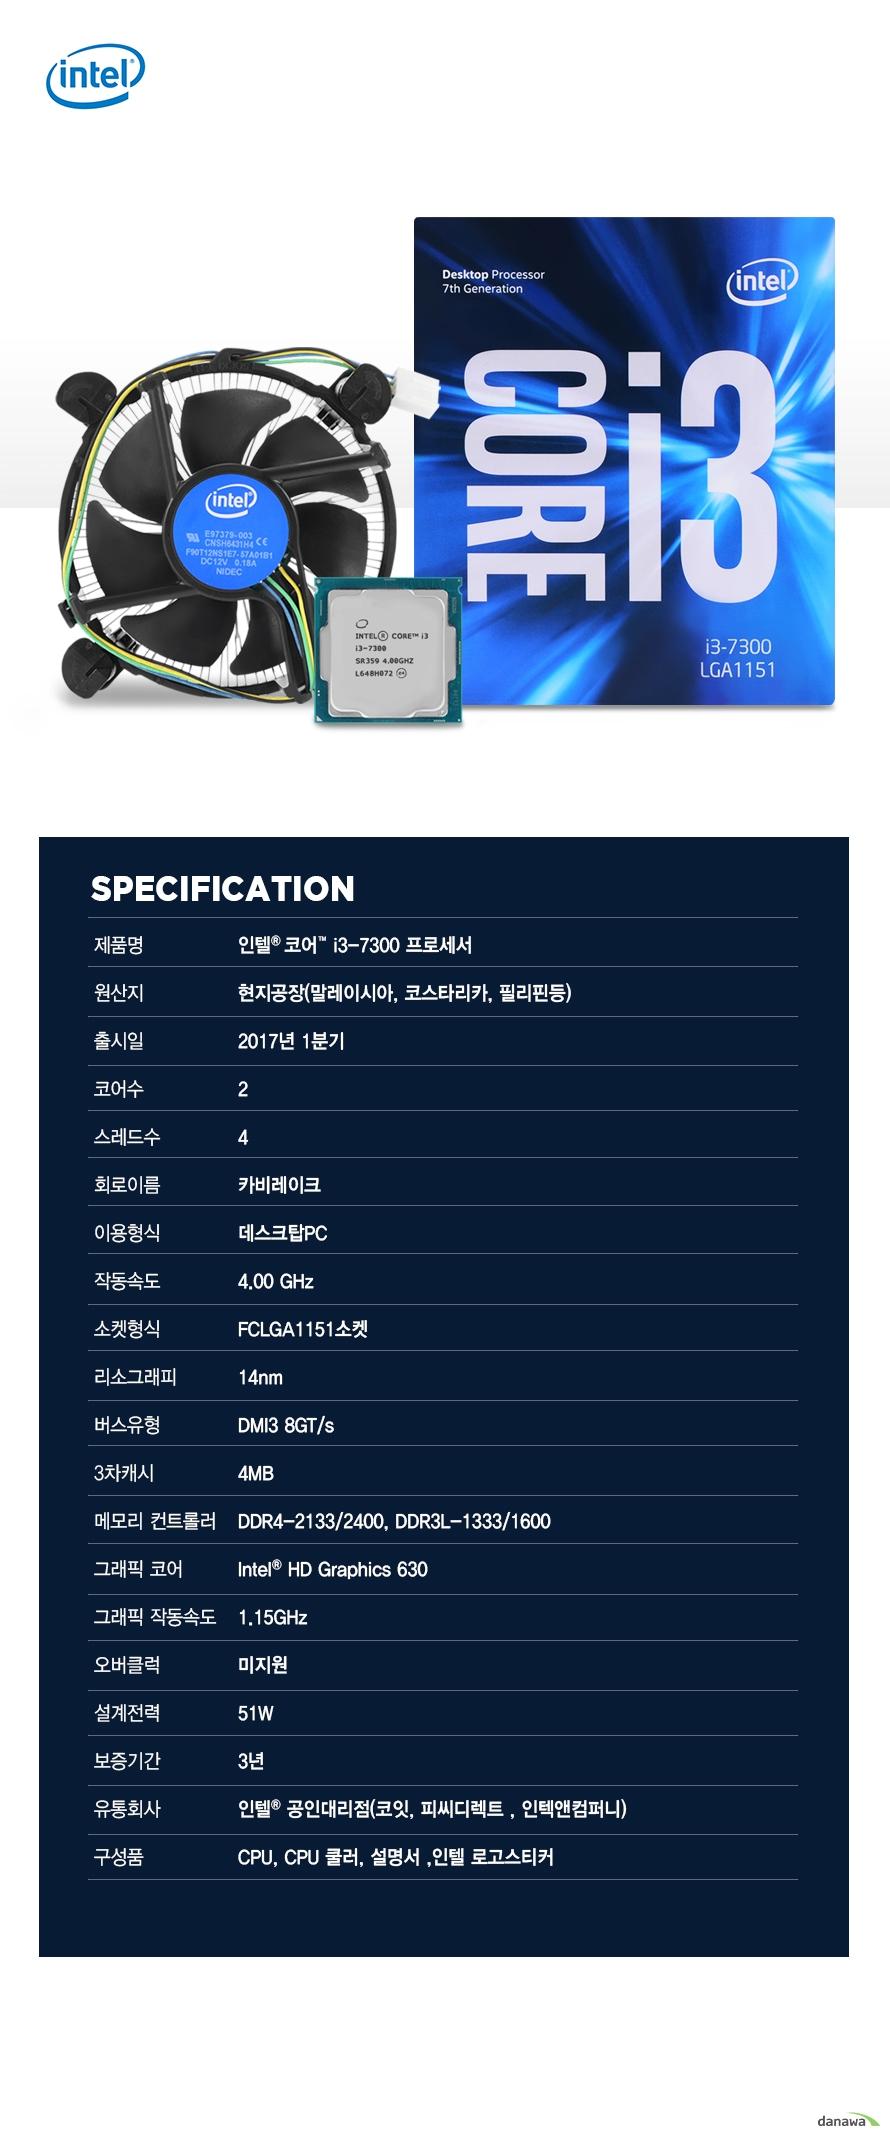 SPECIFICATION                제품명 인텔 코어 i3 - 7300 프로세서                        원산지 현지공장 말레이시아 코스타리카 필리핀등                출시일 2017년 1분기                코어수 2                스레드수 4                회로이름 카비레이크                이용형식 데스크탑PC                작동속도 4.00GHZ                소켓형식 FCLGA1151소켓                리소그래피 14NM                버스유형 DMI3 8GT/S                3차캐시 4MB                메모리 컨트롤러 DDR4-2133/2400 DDR3L-1333/1600                그래픽 코어 INTEL HD GRAPHICS 630                그래픽 작동속도 1.15GHZ                오버클럭 미지원                설계전력 51W                보증기간 3년                유통회사 인텔 공인대리점 코잇 피씨디렉트 인텍엔 컴퍼니                구성품 CPU CPU쿨러 설명서 인텔 로고스티커